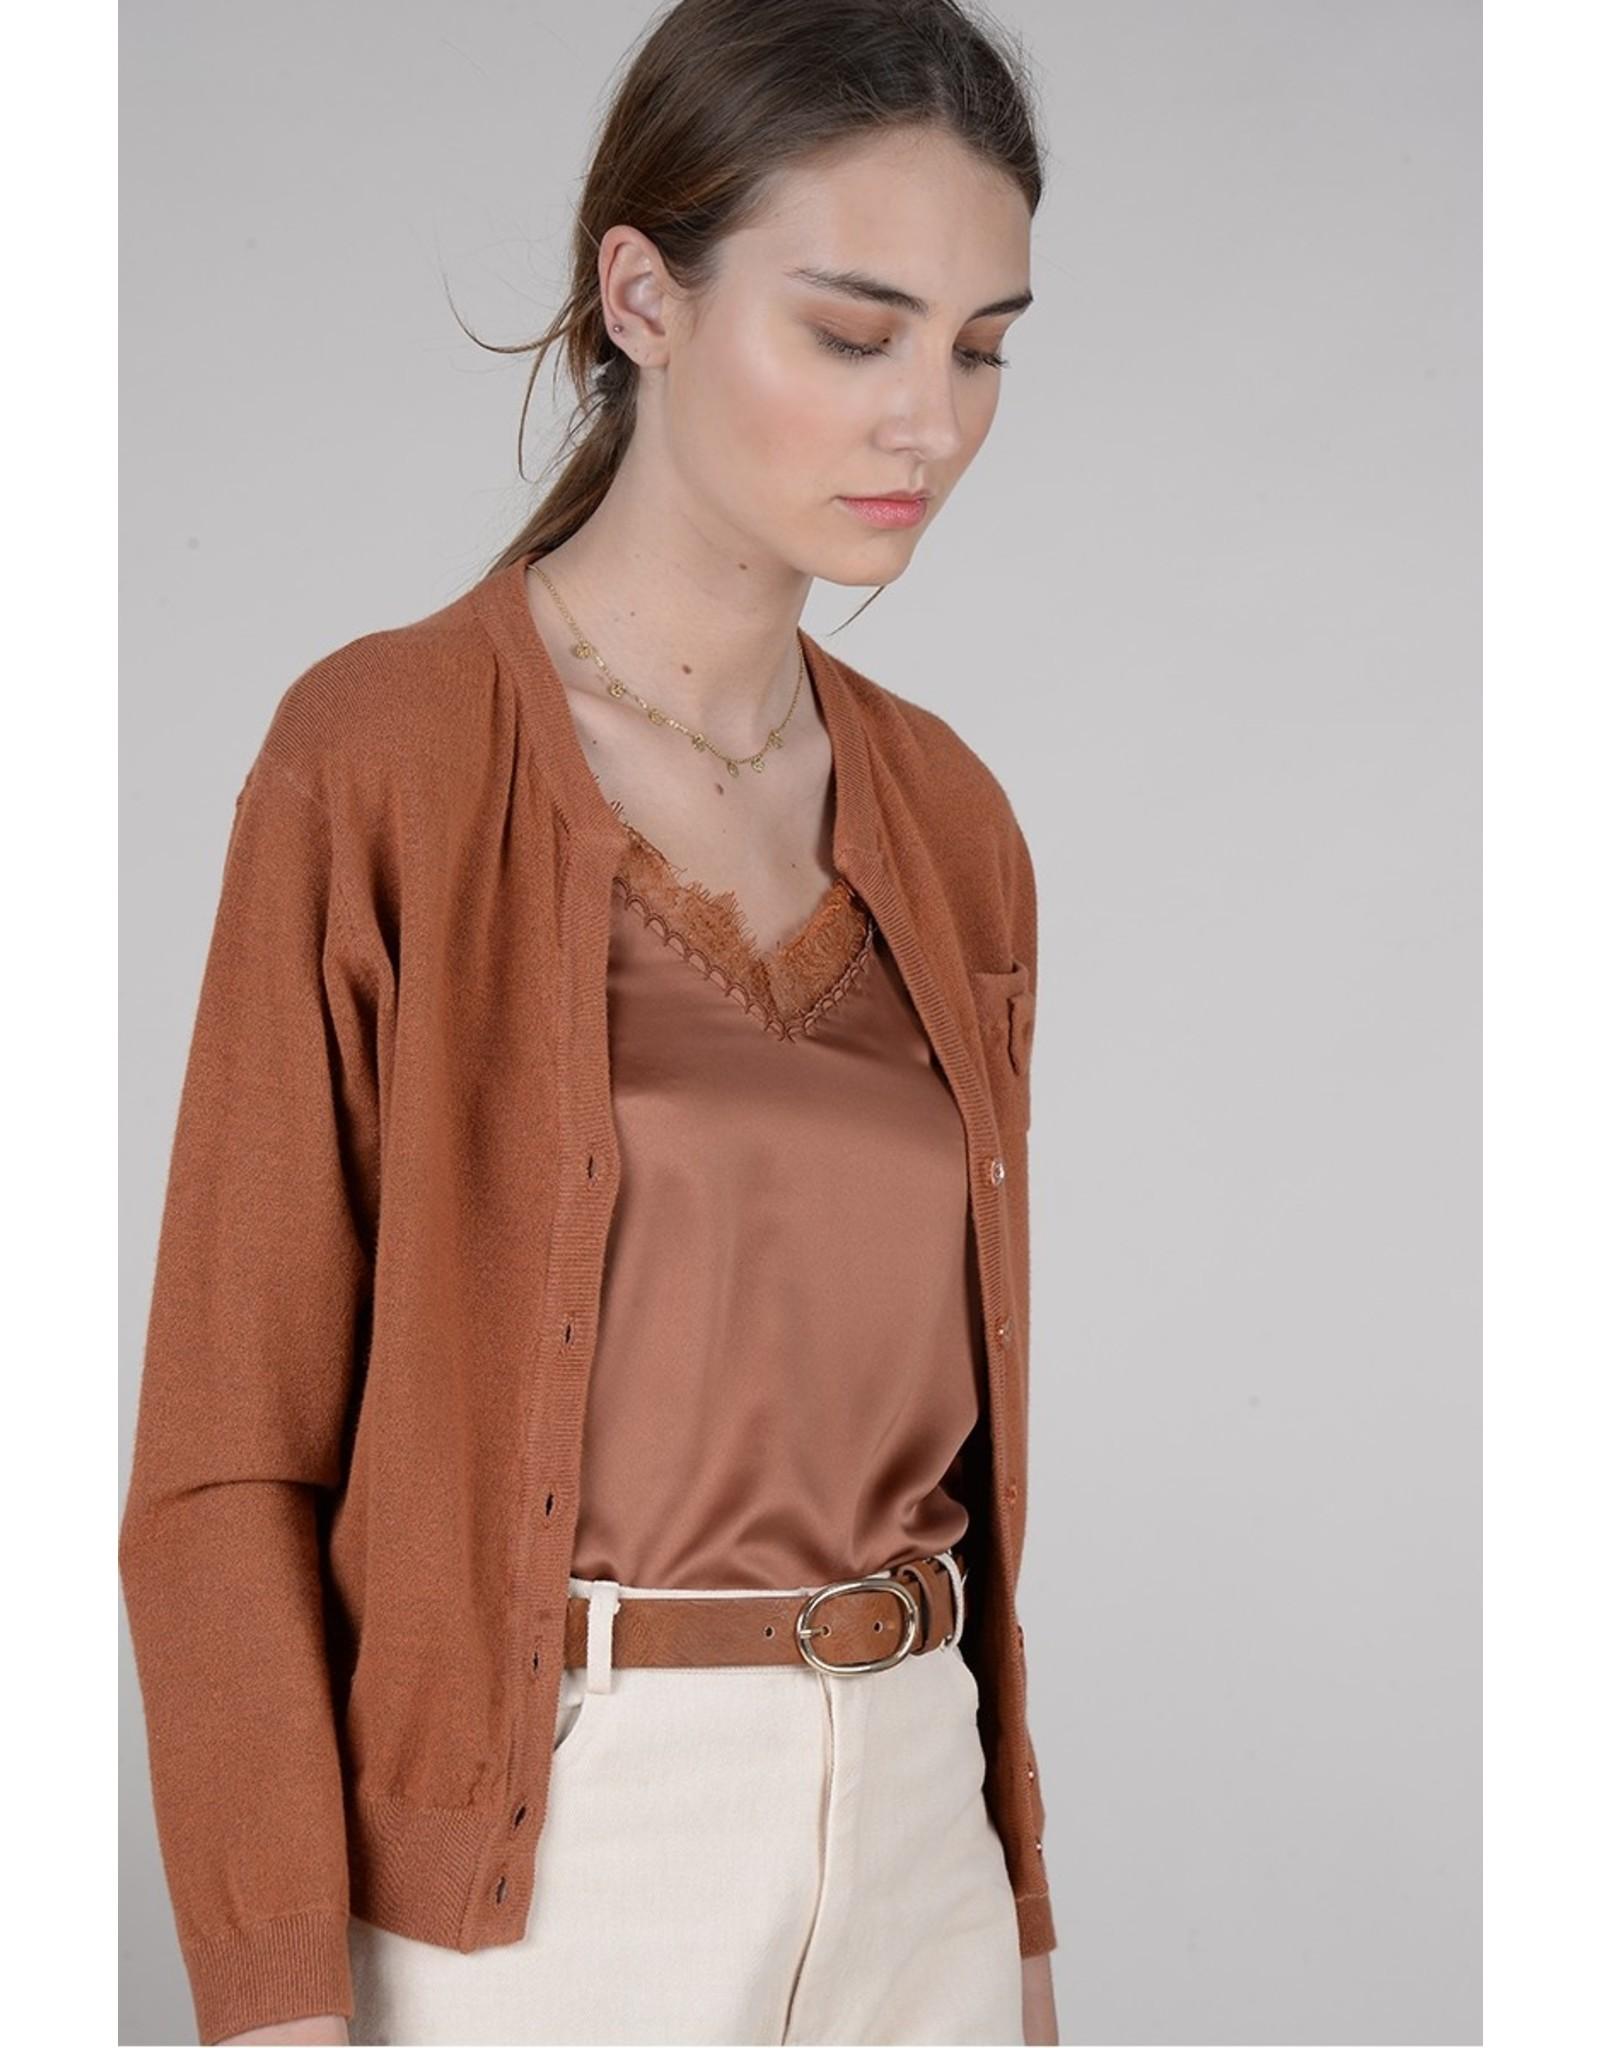 Molly Bracken Molly Bracken - V neck camisole (camel)